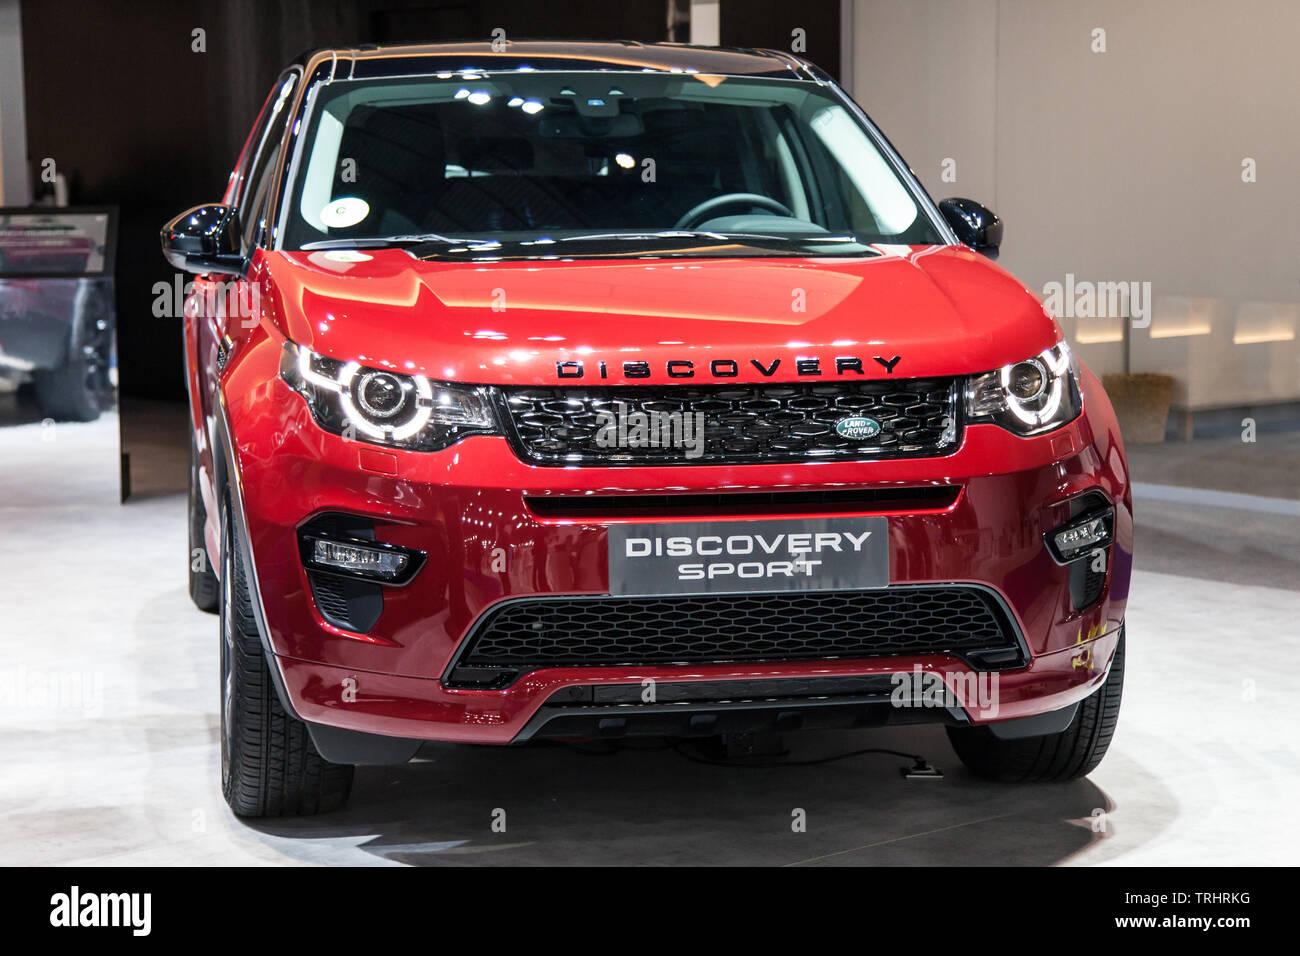 Range Rover Stock Photos & Range Rover Stock Images - Alamy